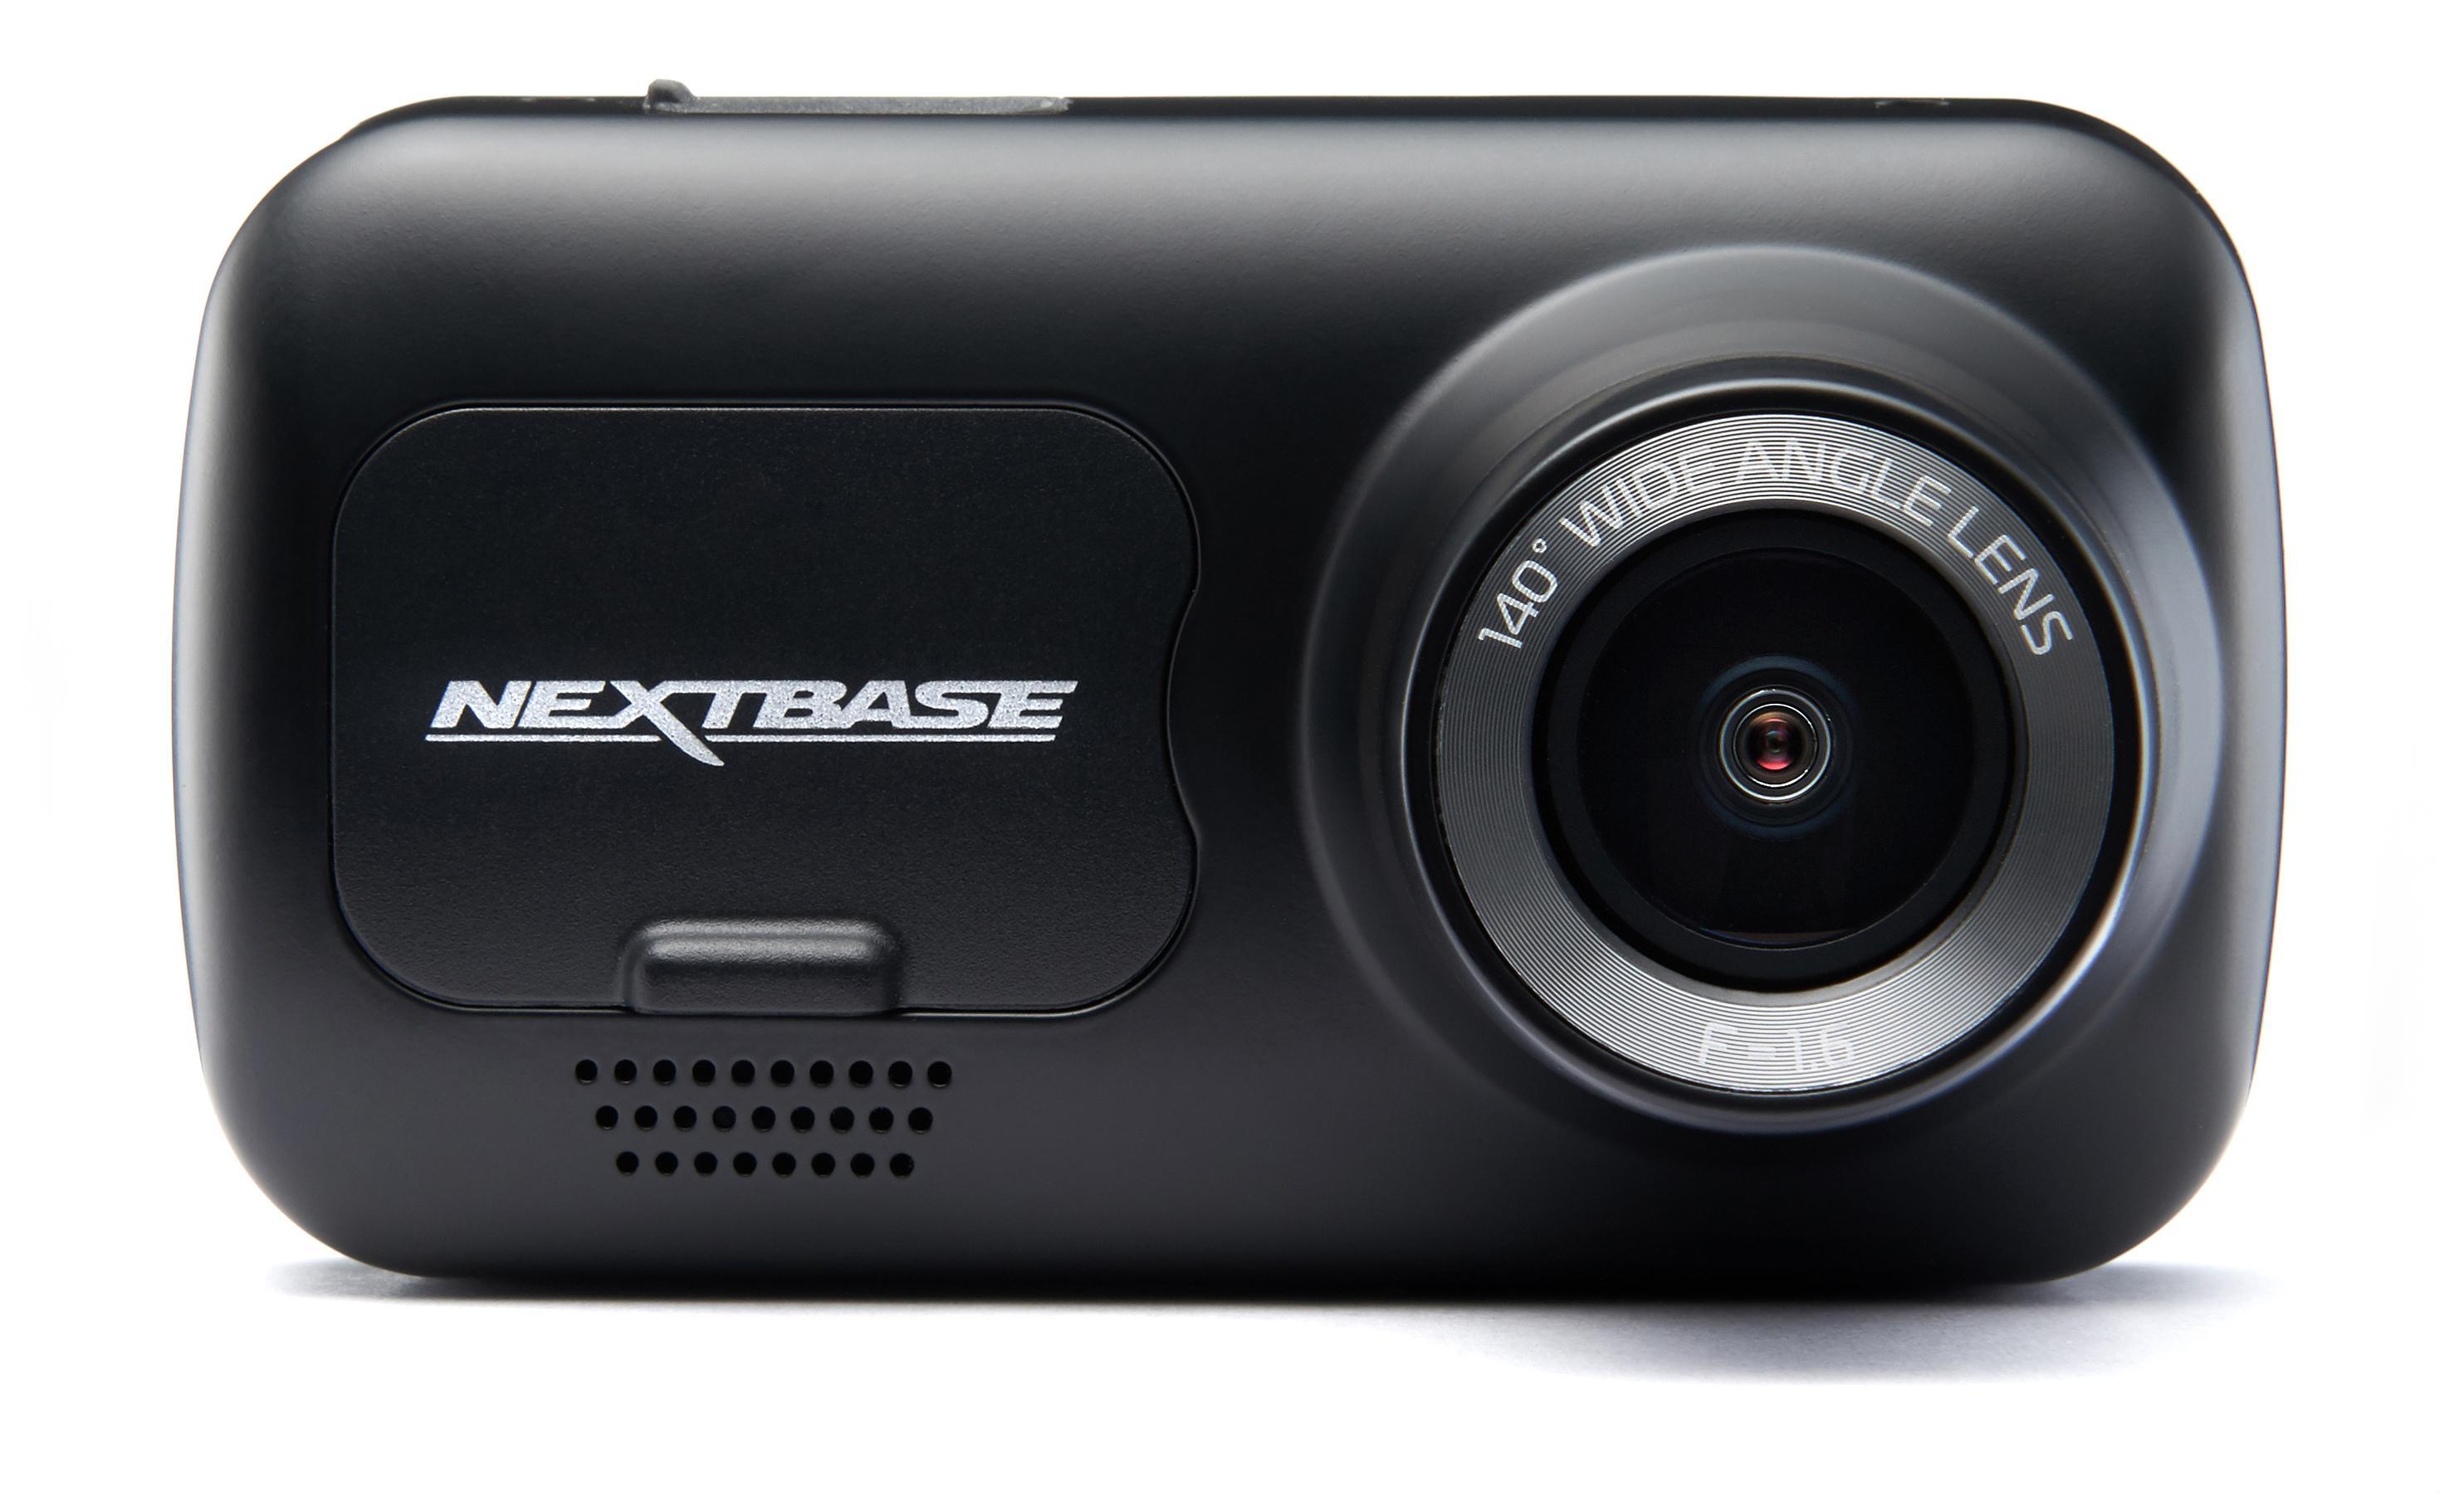 Nextbase 222 Dash Cam 140° View Angle G Sensor Night Vision Full HD 1080p £44 at Halfords/ebay-with code